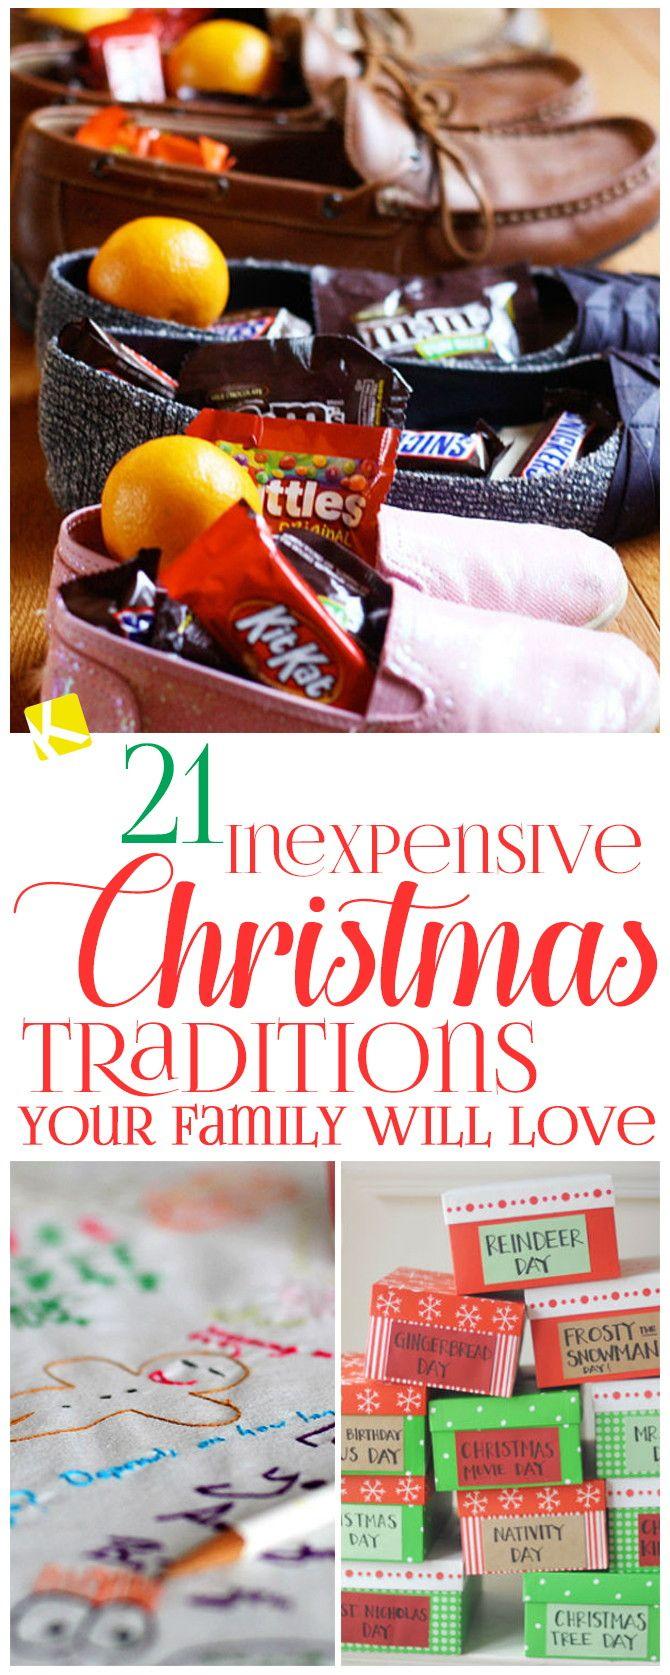 21 Free Or Cheap Family Christmas Traditions The Krazy Coupon Lady Christmas Traditions Family Cheap Christmas Inexpensive Christmas